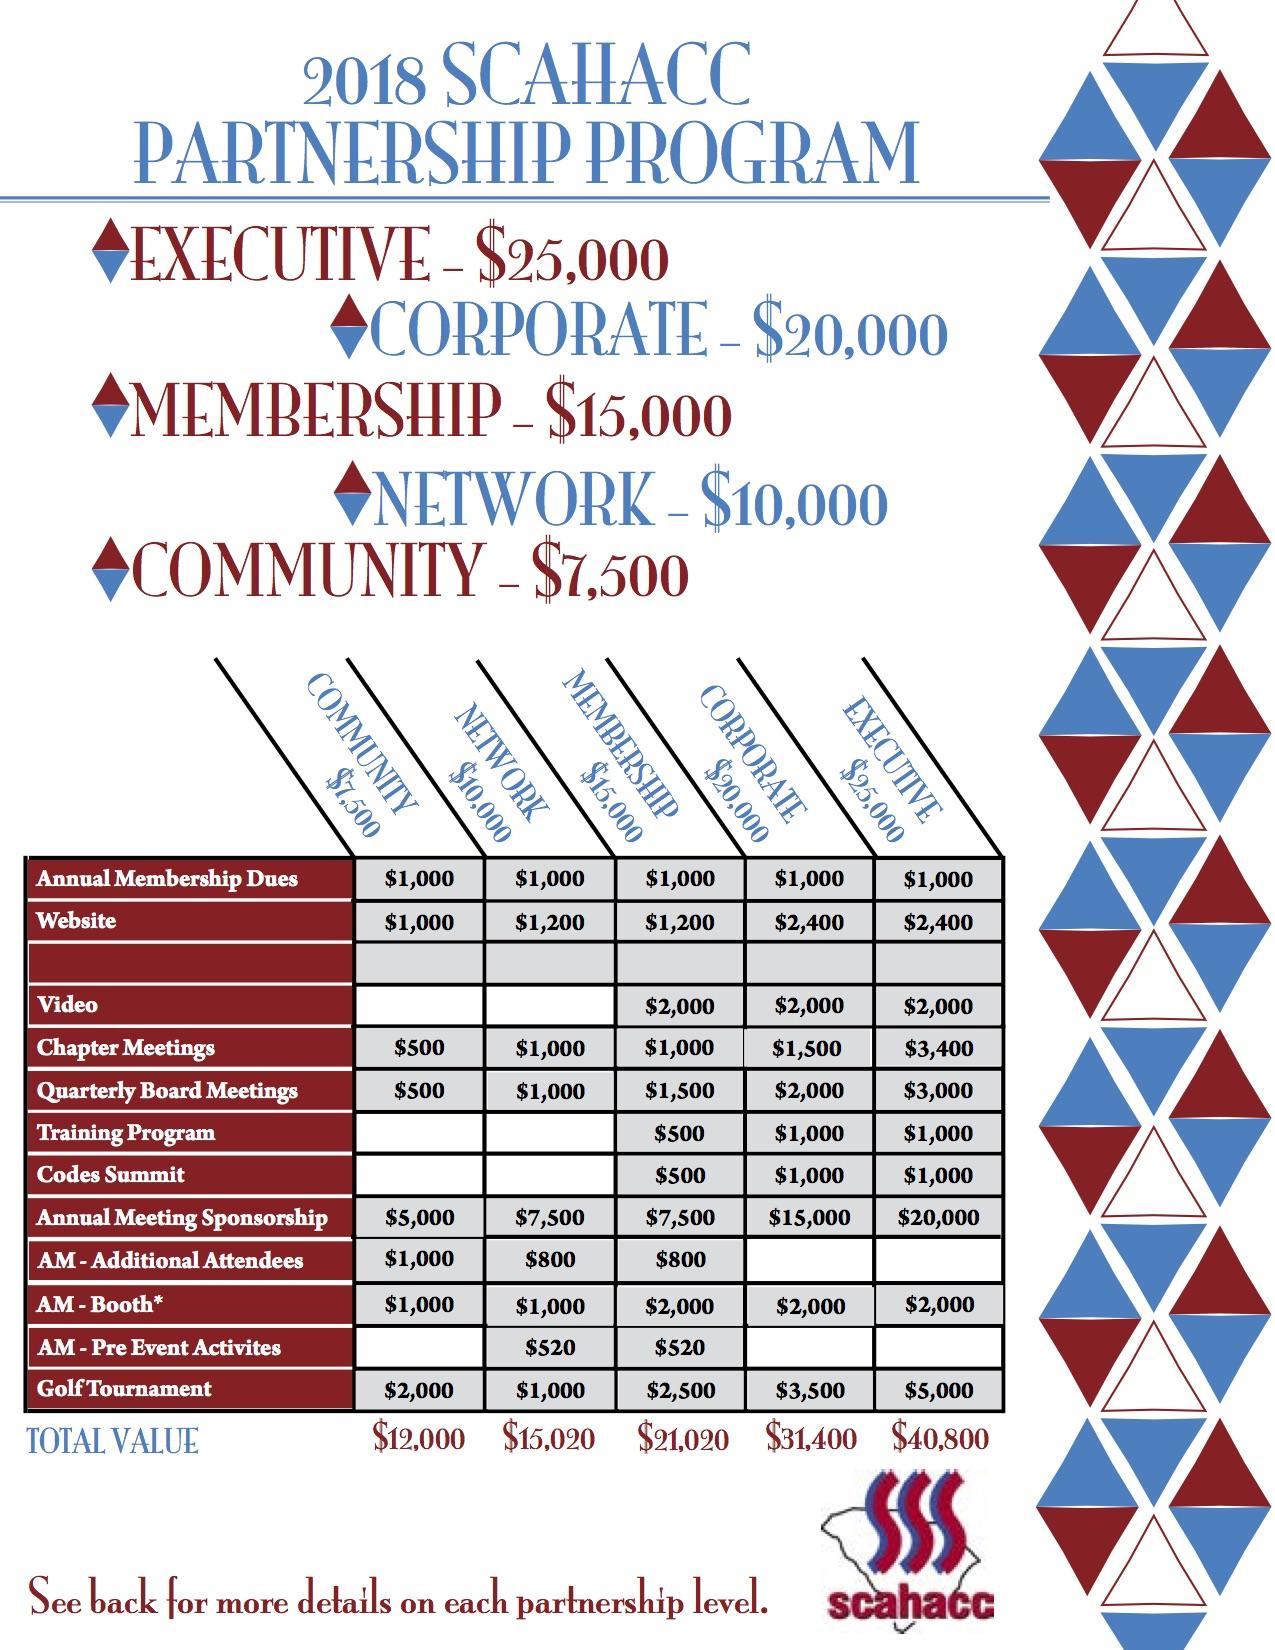 2018 Partnership Program - SCAHACC